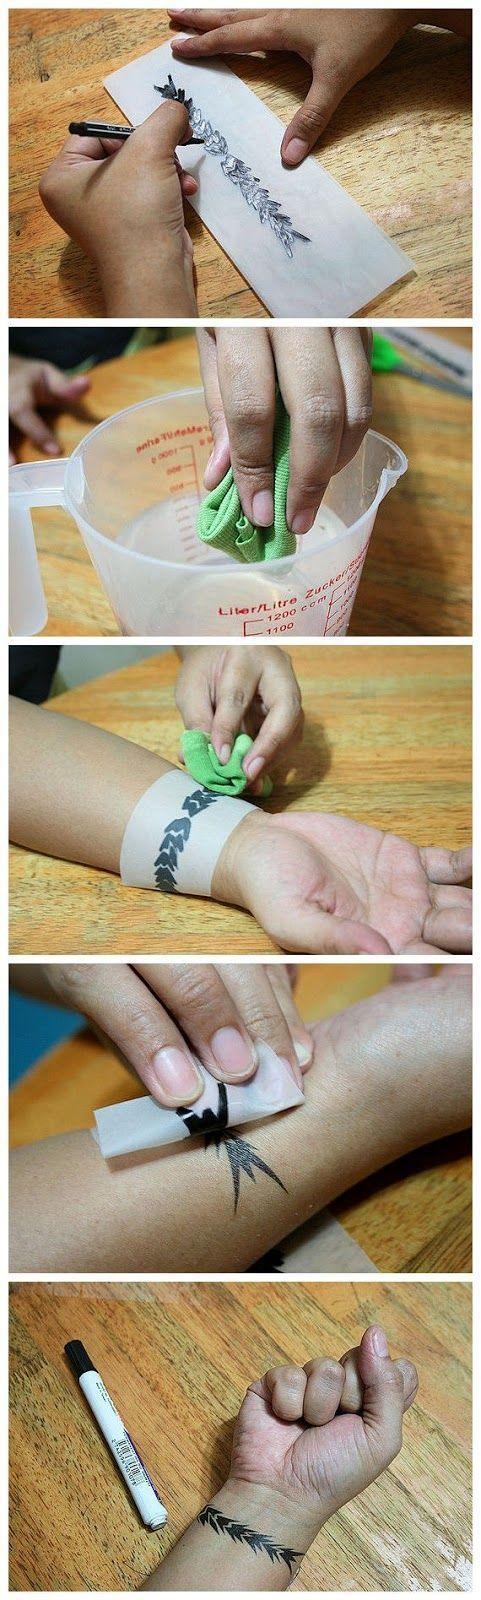 Make a Temporary Tattoo | Cool | Make temporary tattoo, Tattoos, Diy ...